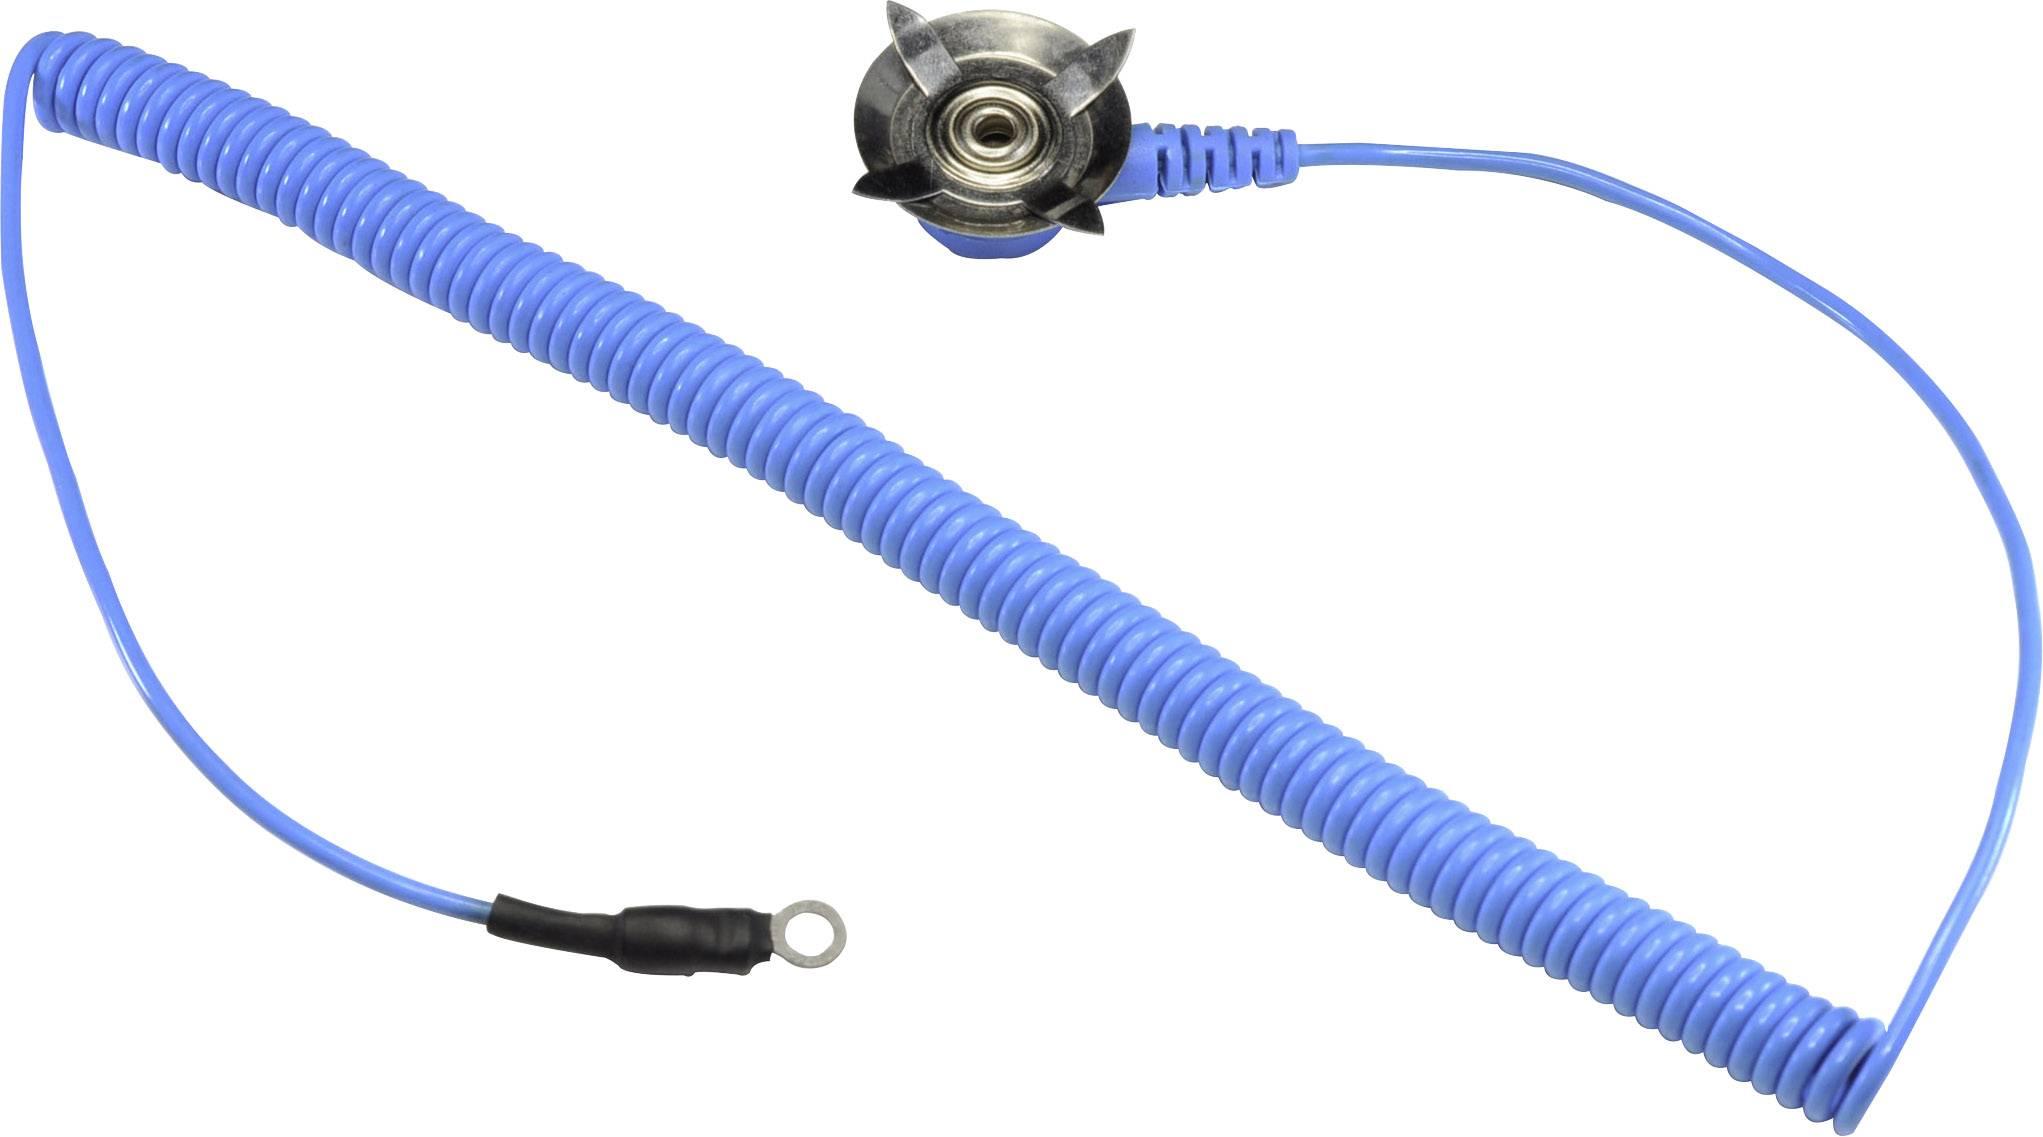 ESD uzemňovací kábel k rohožke TRU COMPONENTS EkA-183-AD-R, 1.83 m